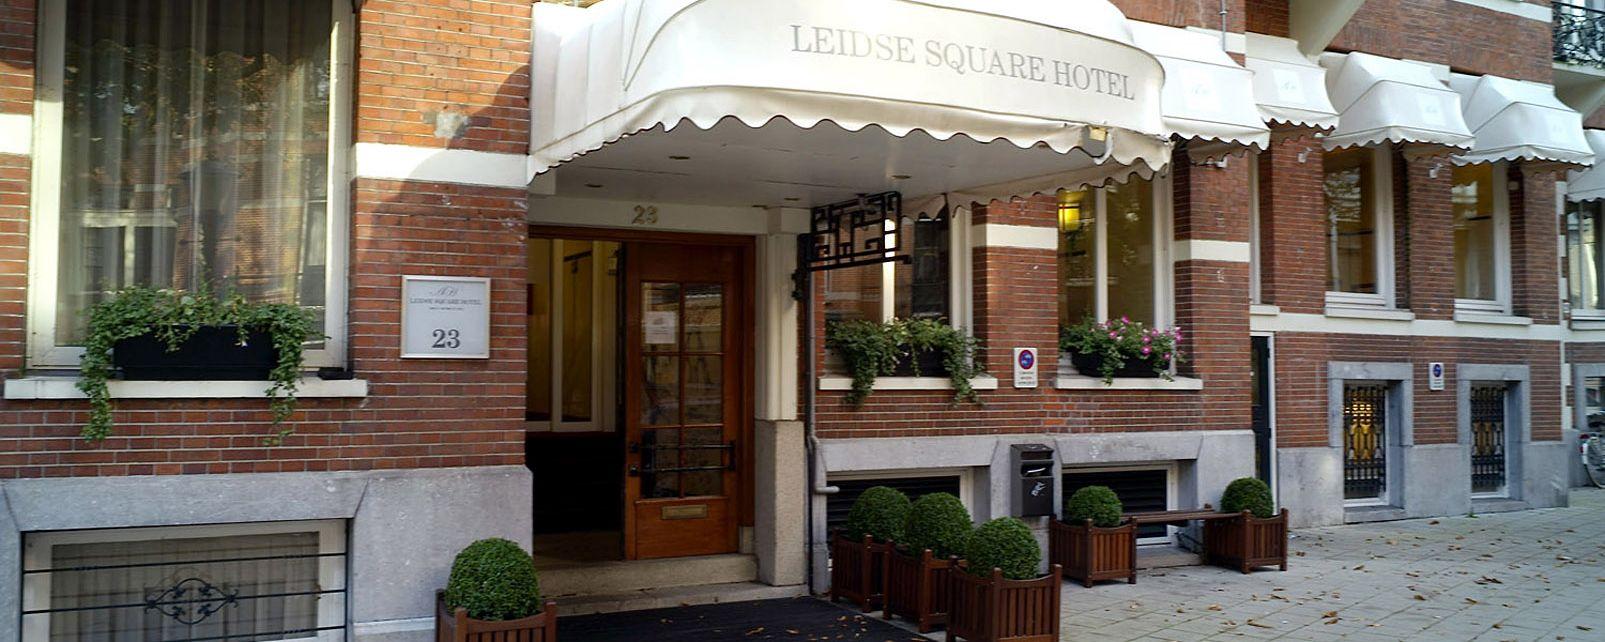 Hotel Leidse Square